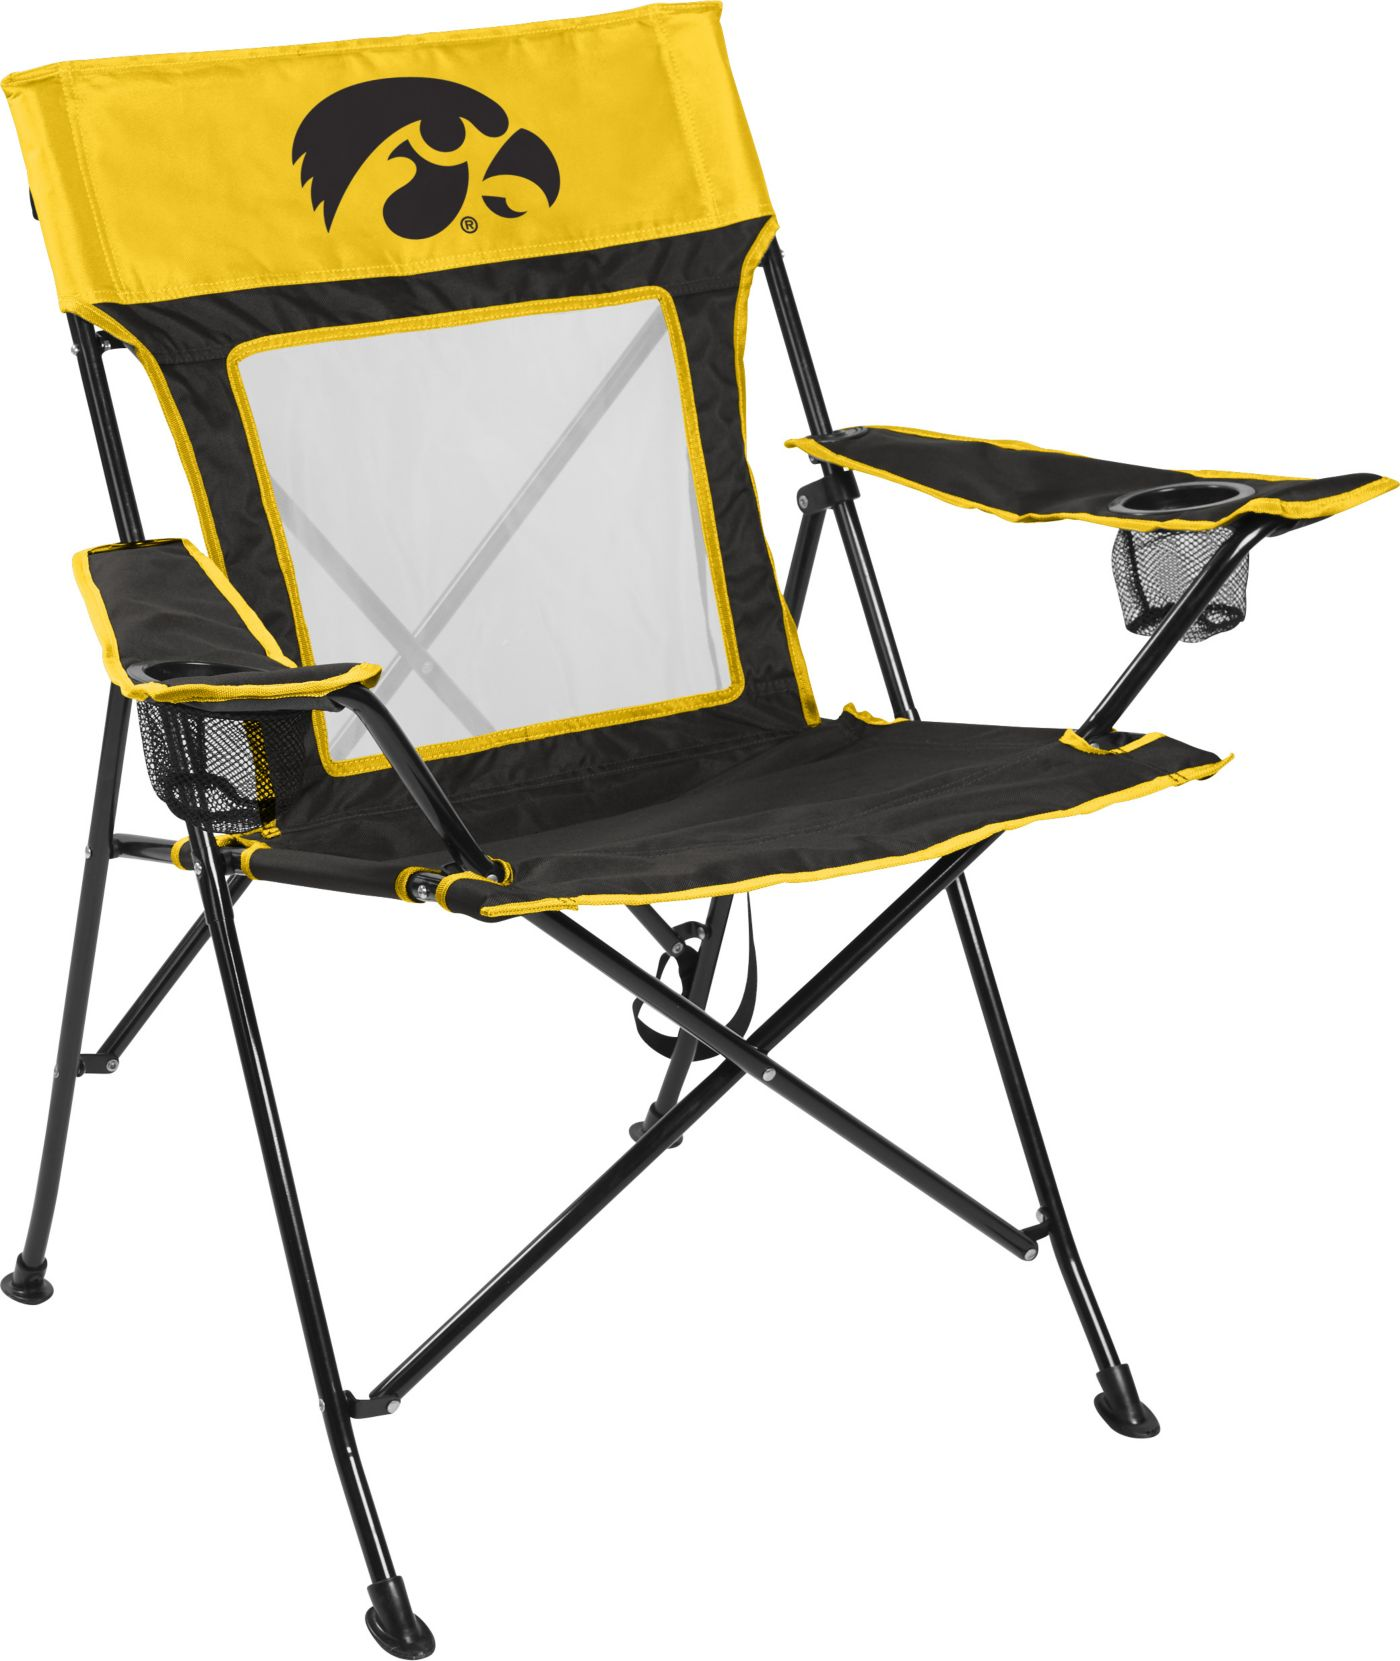 Rawlings Iowa Hawkeyes Game Changer Chair